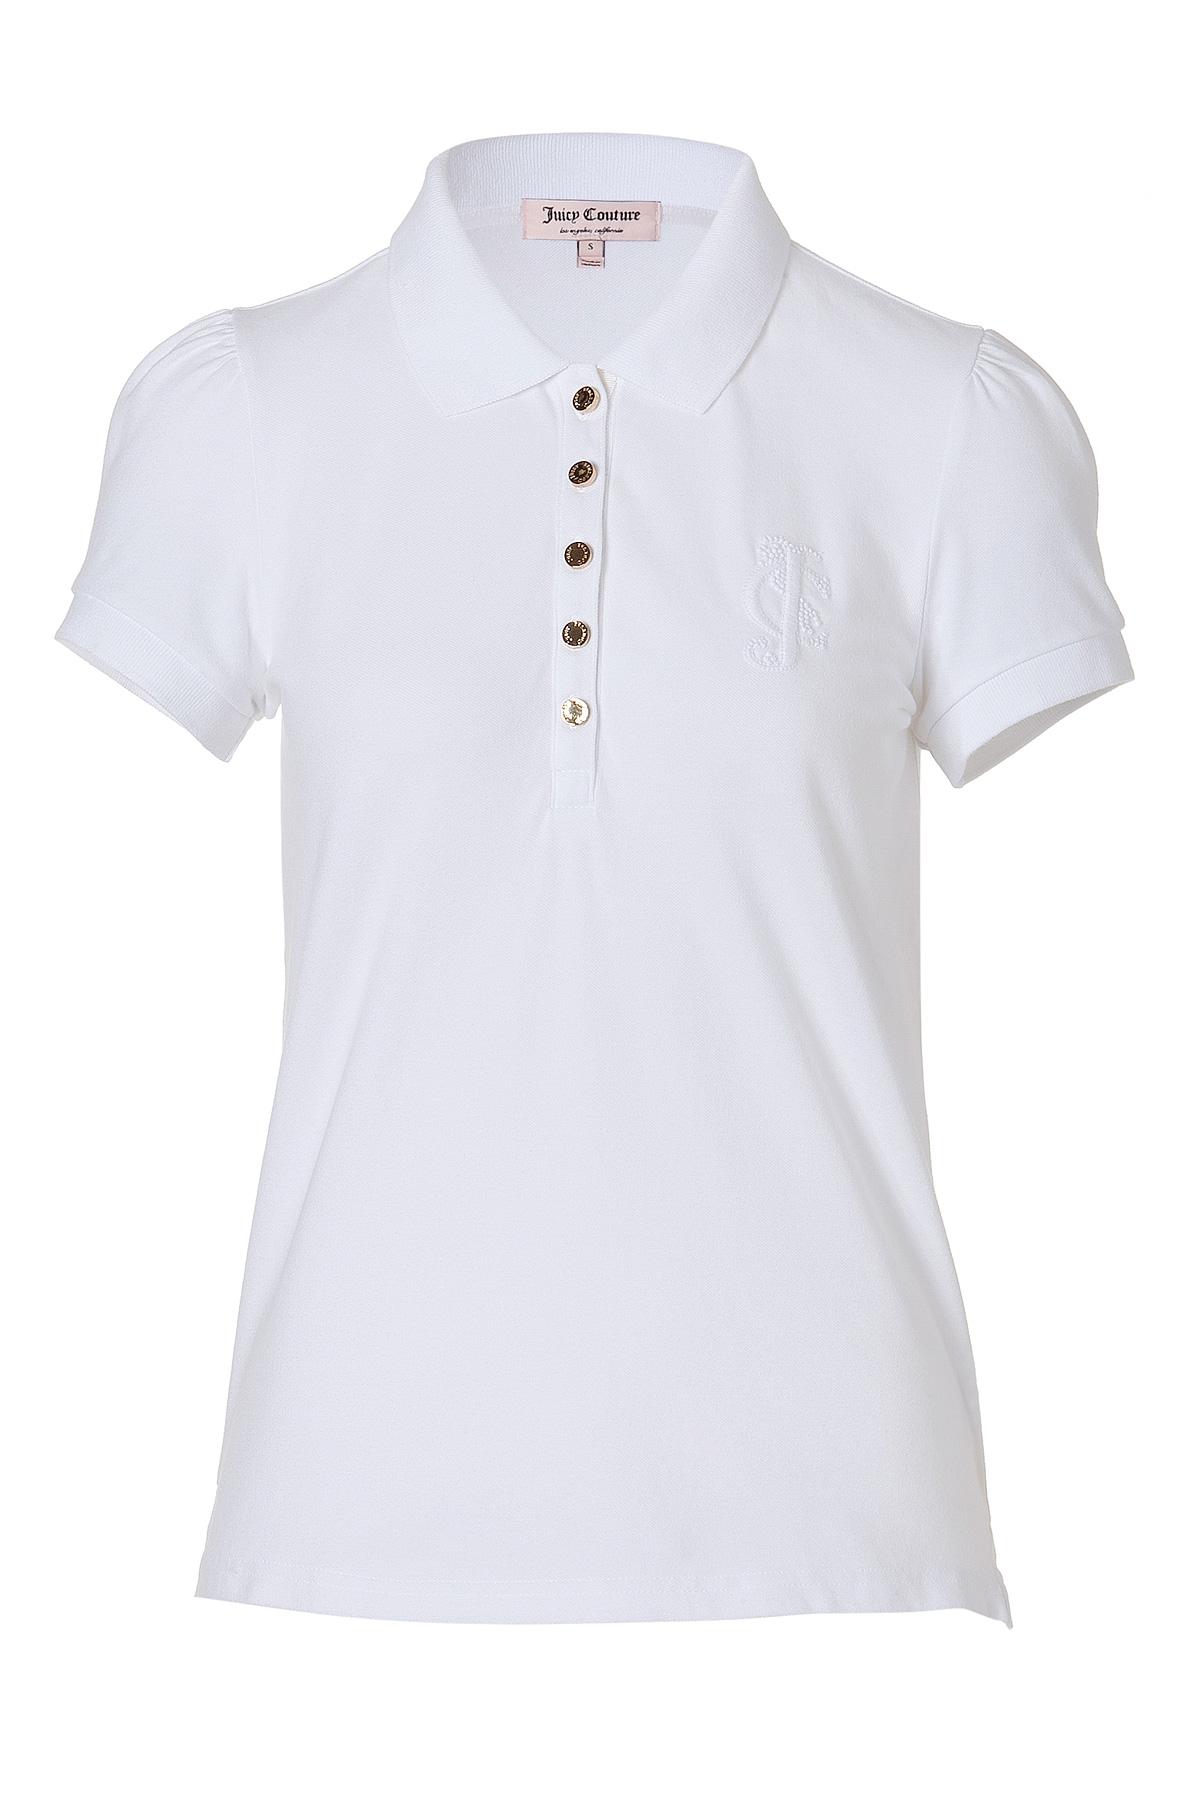 Kenzo T Shirt Womens